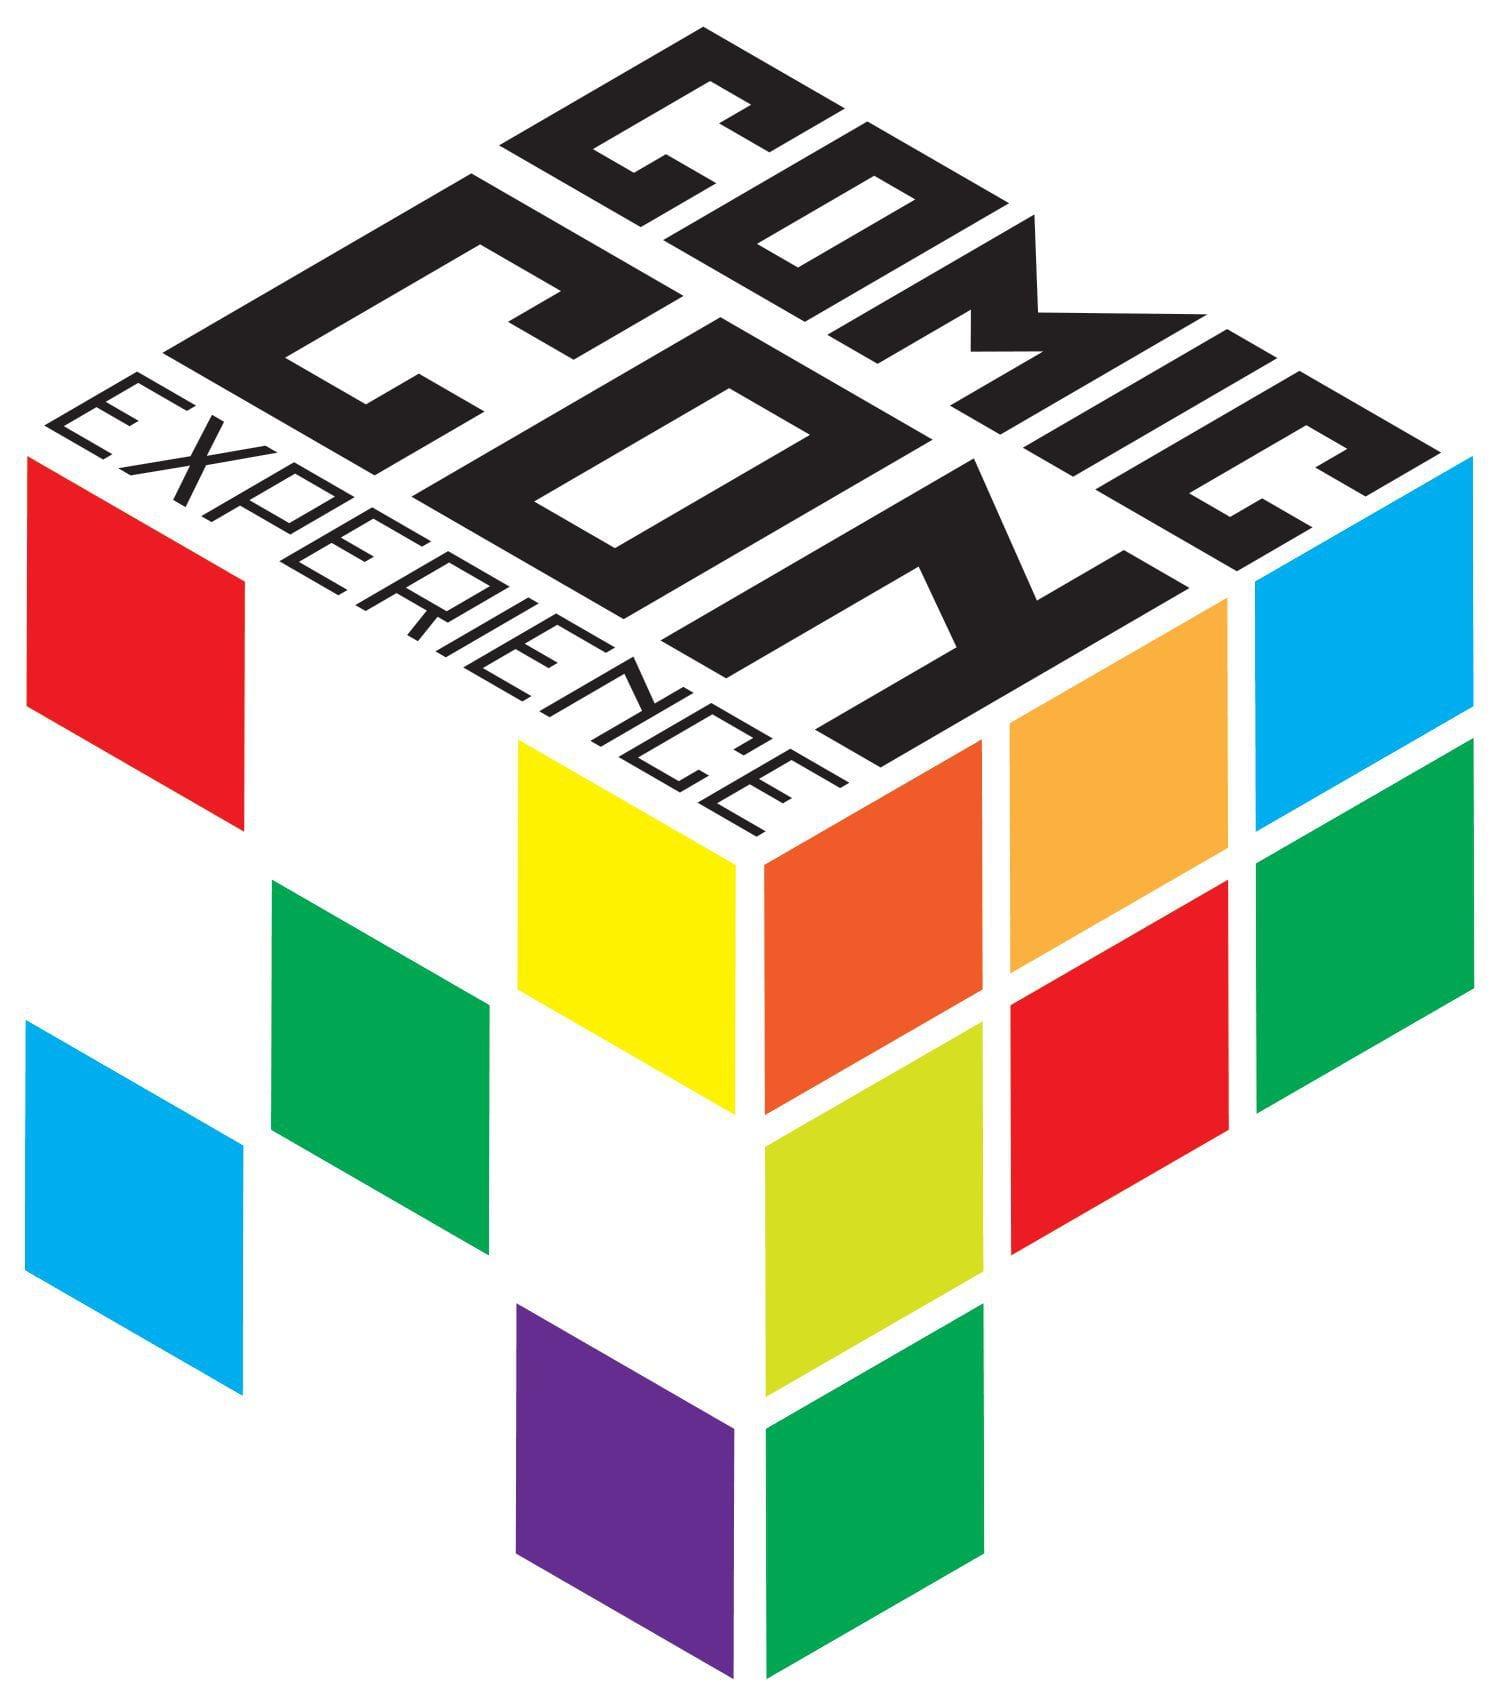 comic-con-experience-trademark-application-in-eu-comiccon-comicconexperience